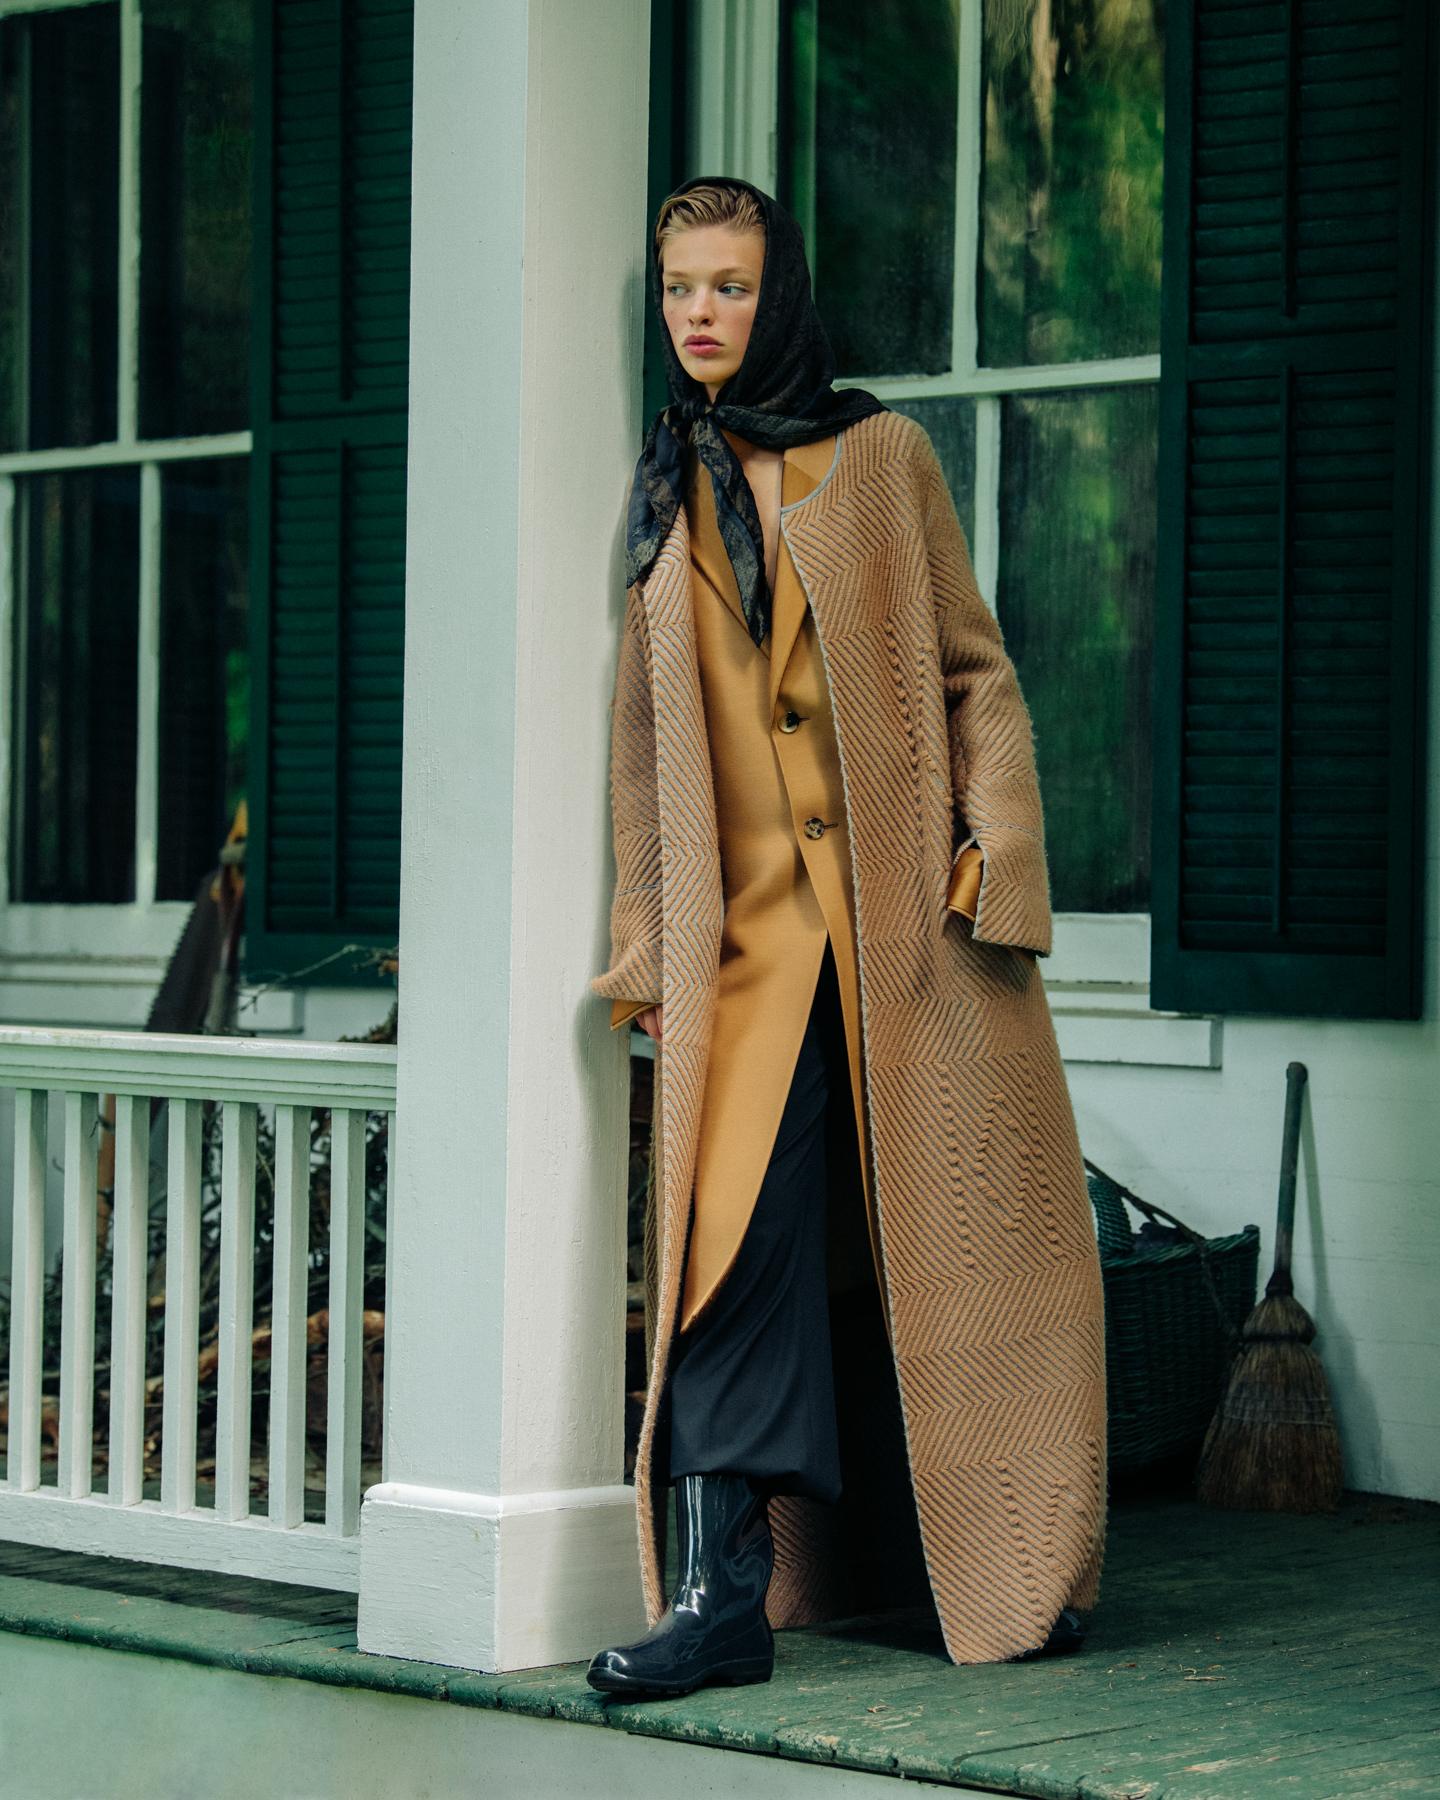 16-Clare-Crawford-by-Ivan-Bideac-for-Vogue-Italia-4001.jpg